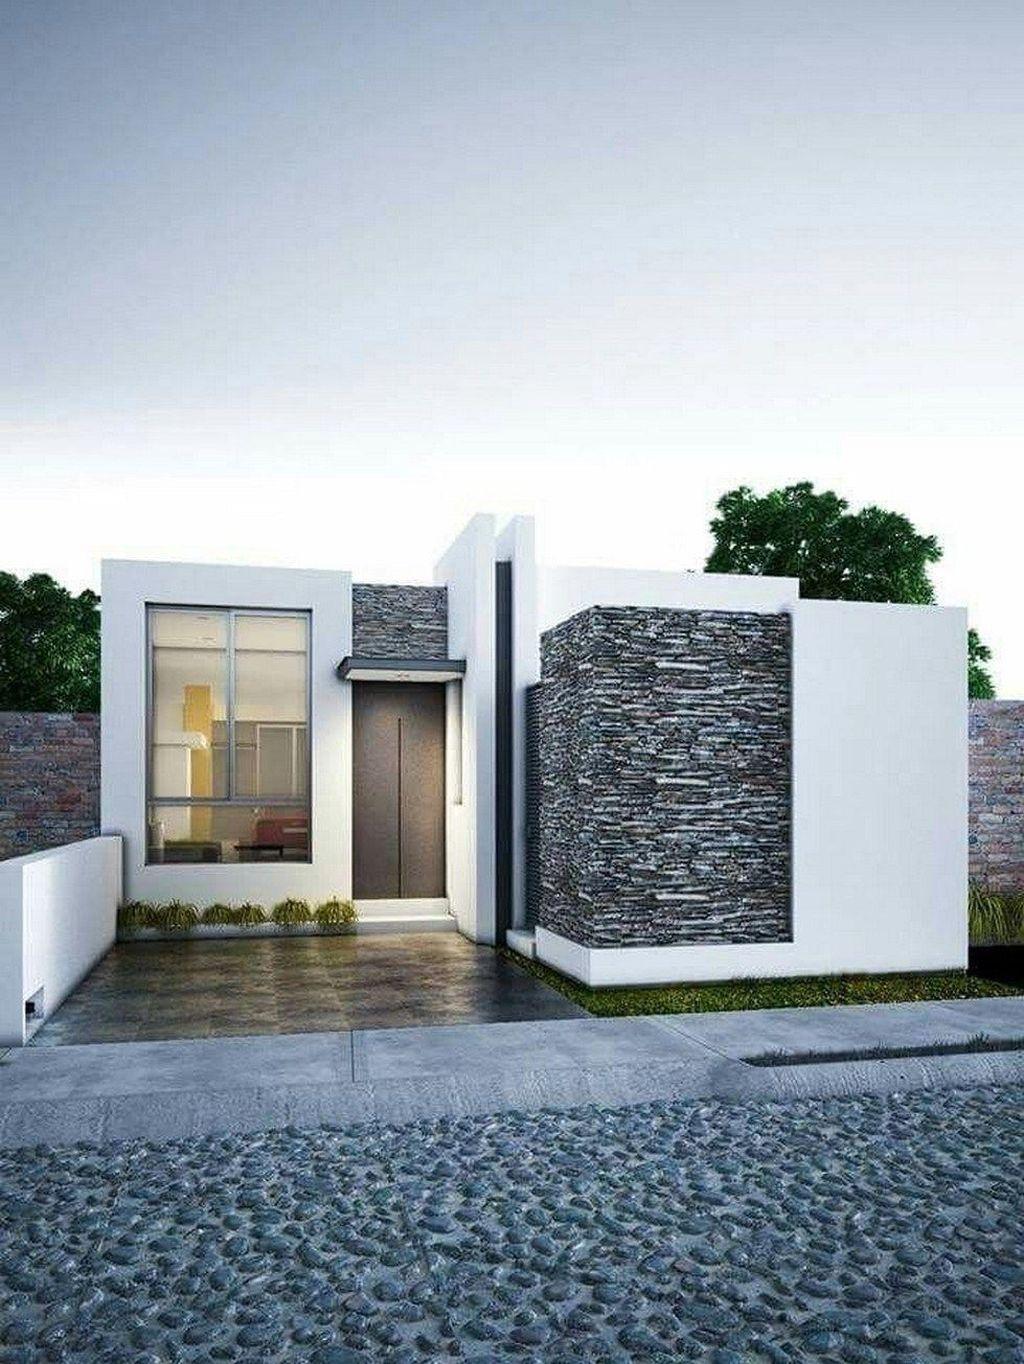 30 Stunning Minimalist Houses Design Ideas That Simple Unique And Modern Modern Minimalist House Facade House Modern Exterior House Designs